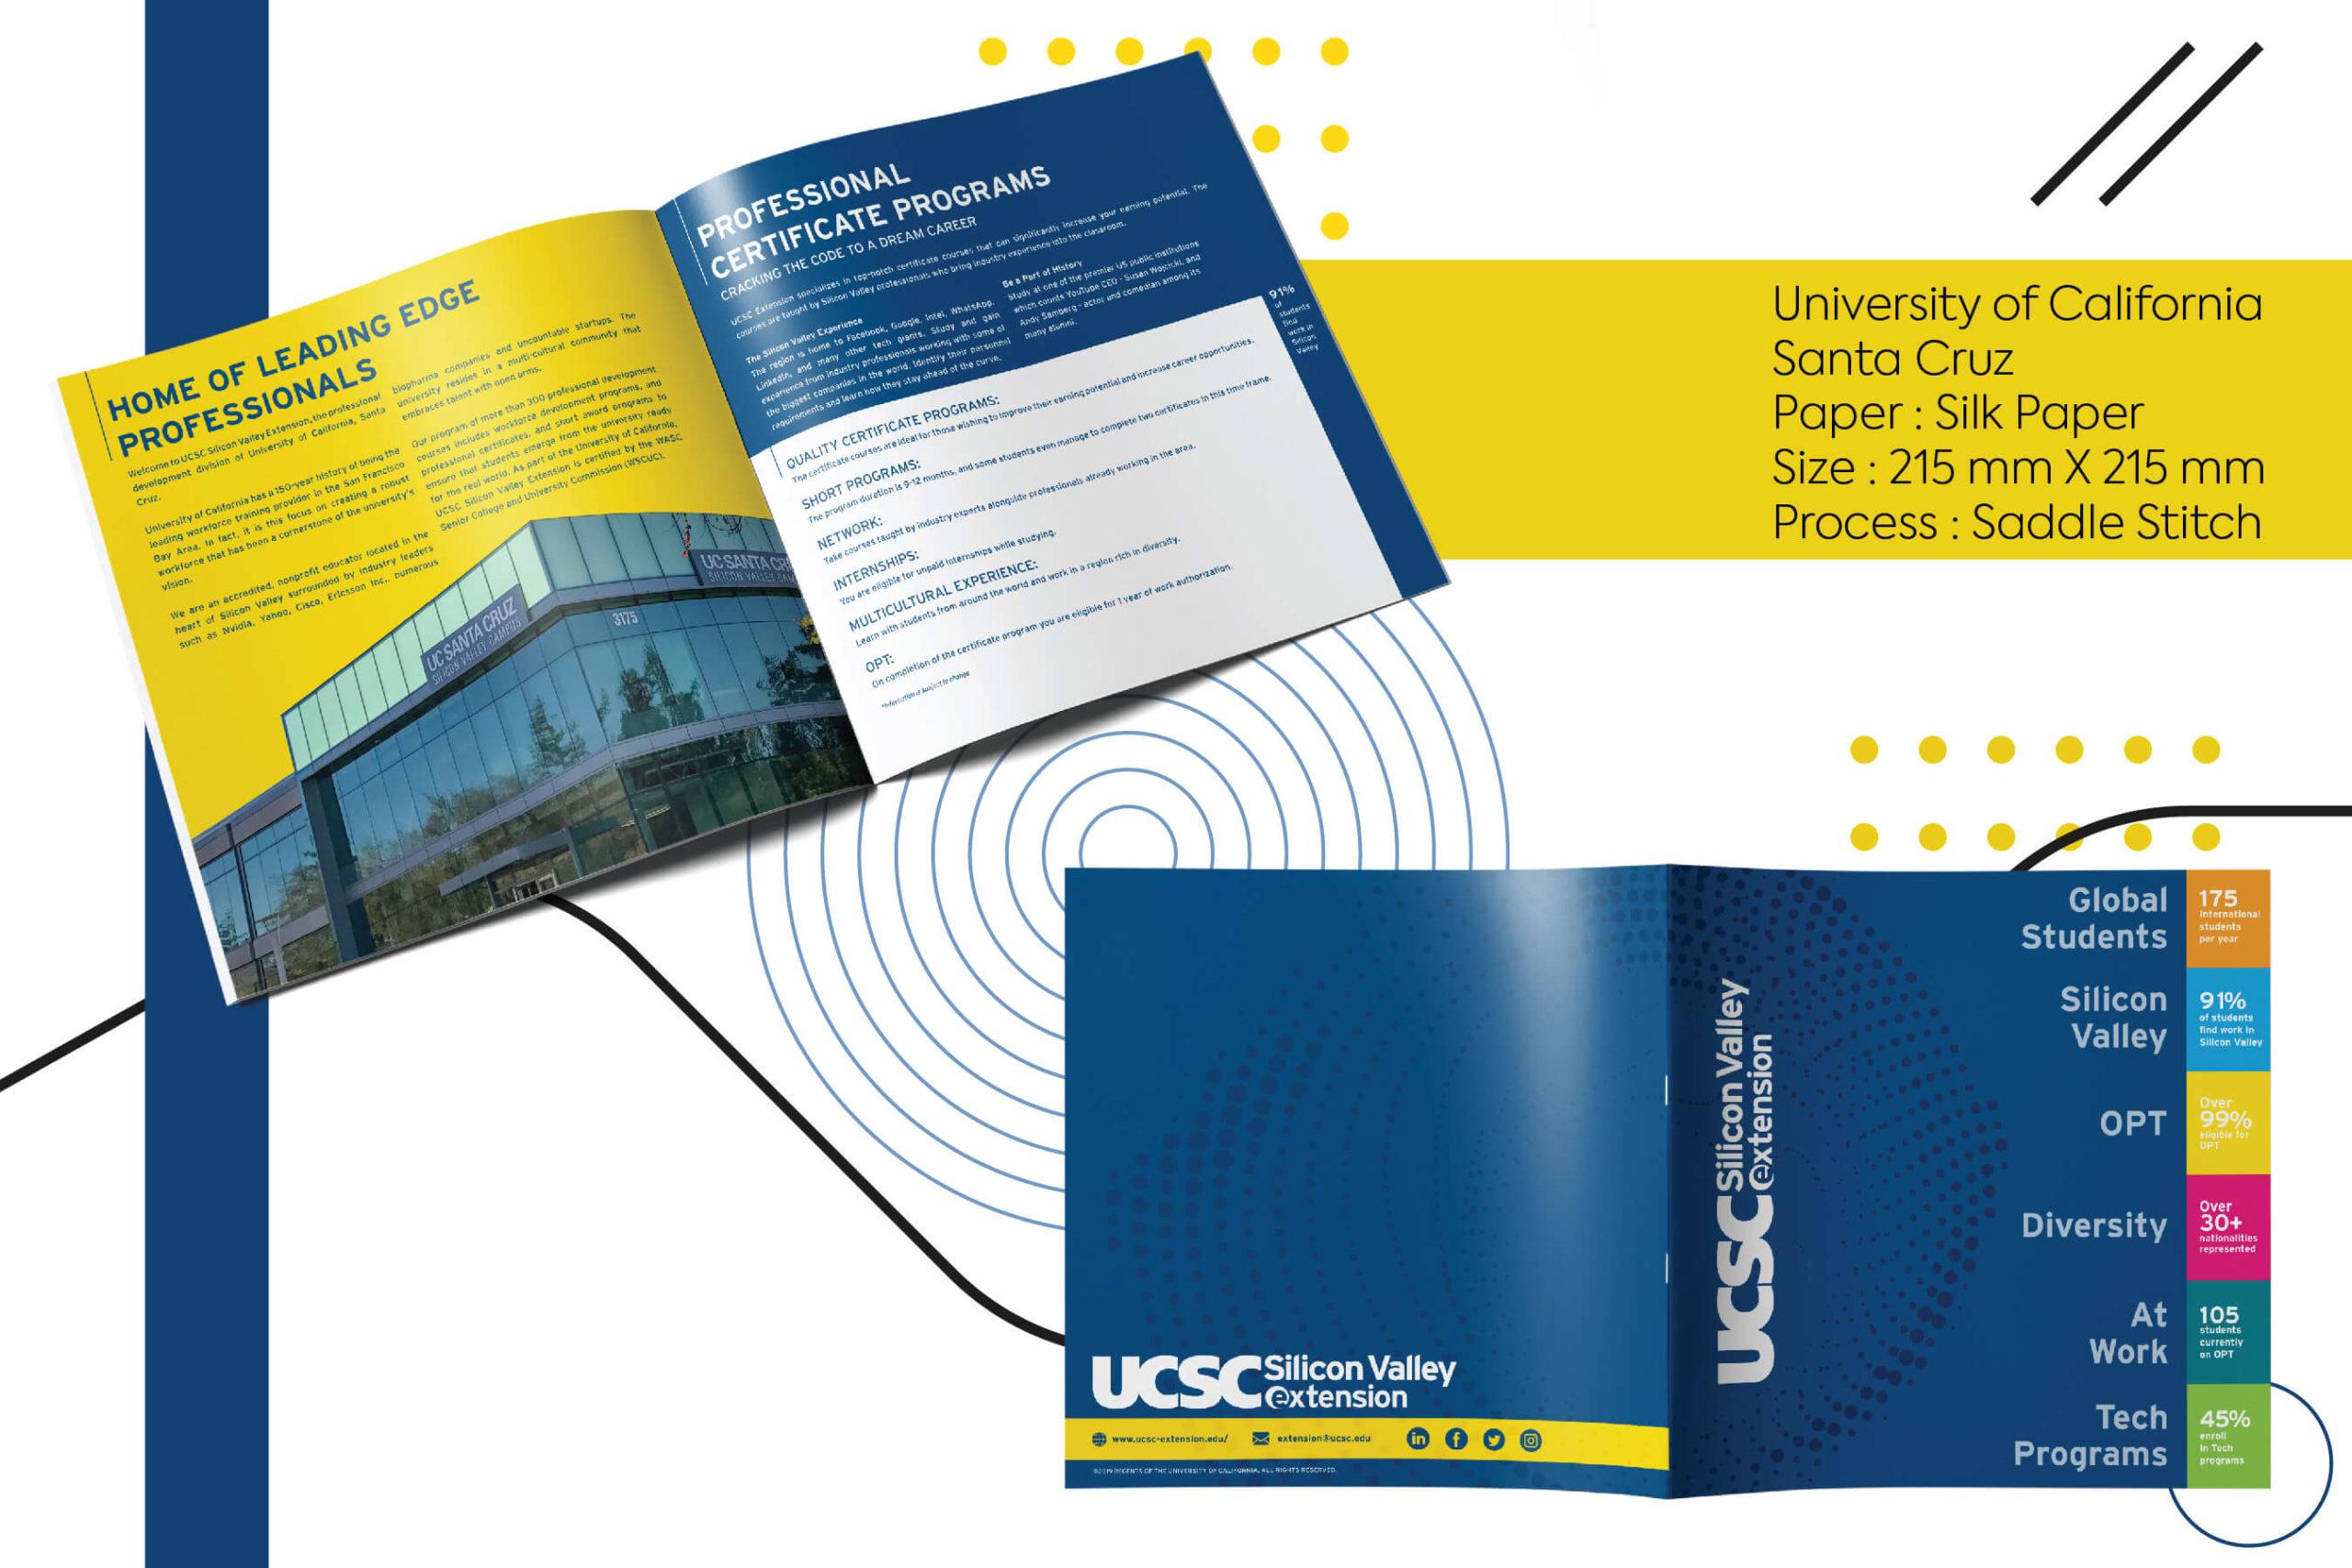 UCSC scaled